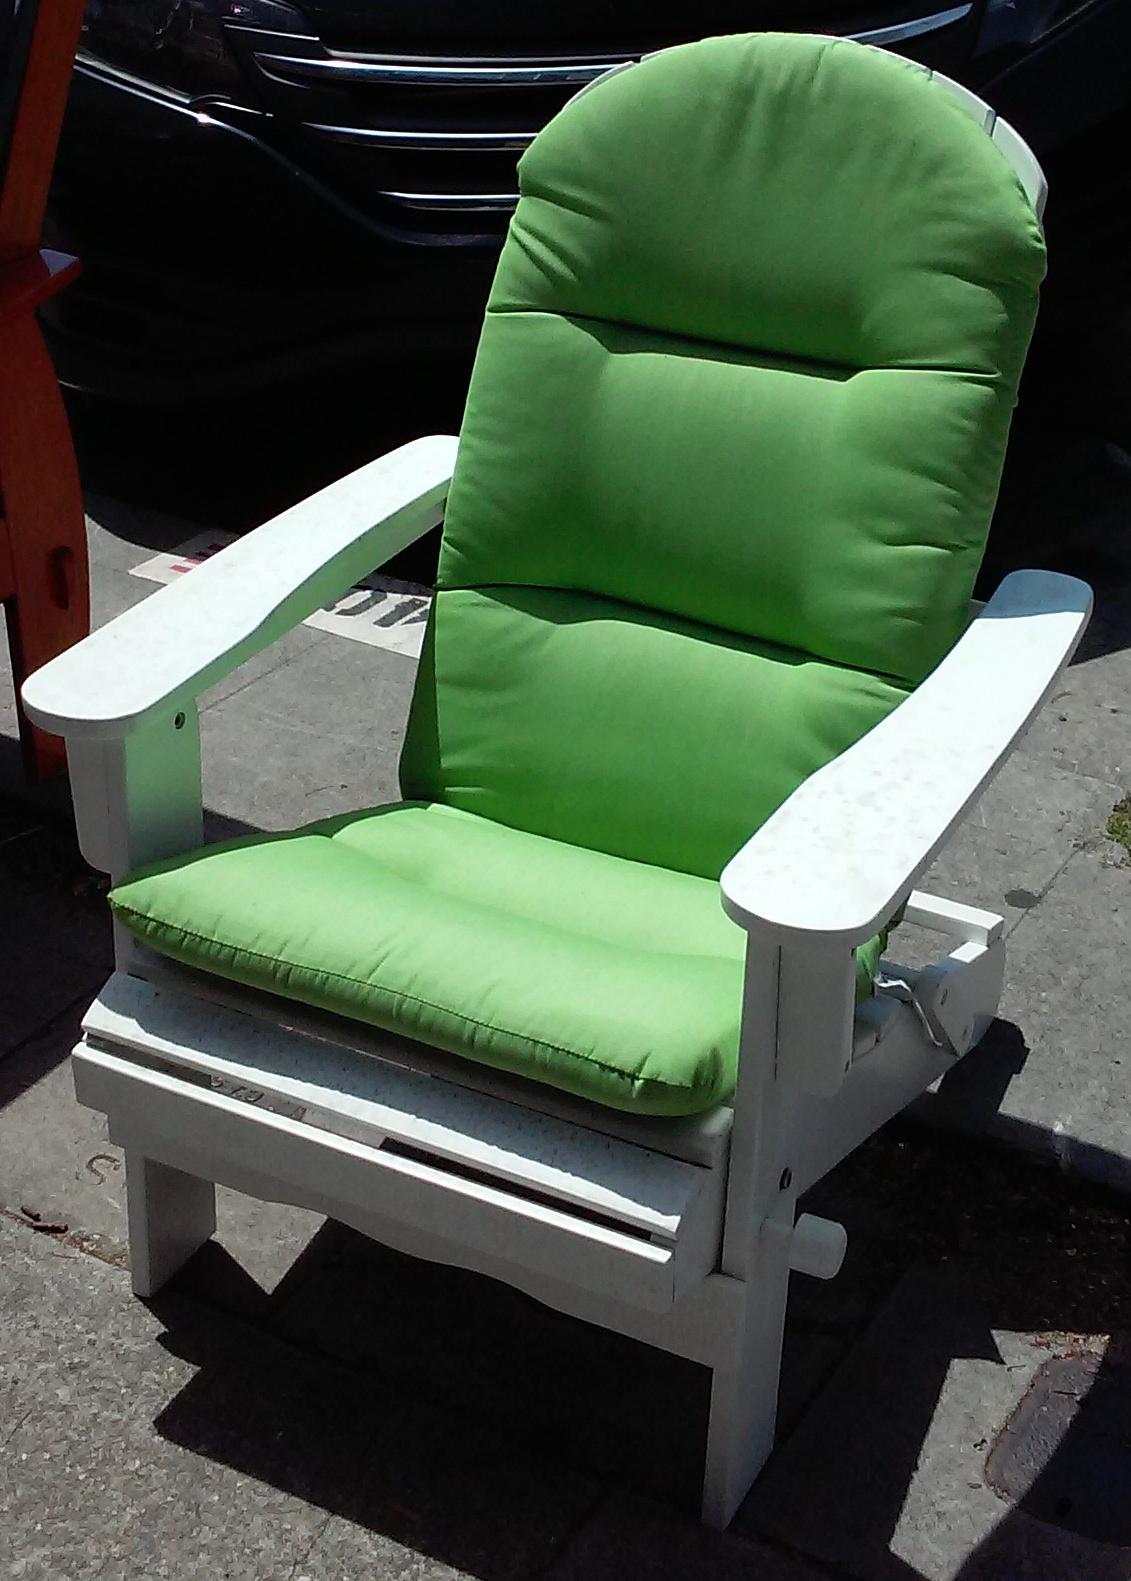 Uhuru Furniture Collectibles Sold 313 Adirondack Style Patio Chair 85